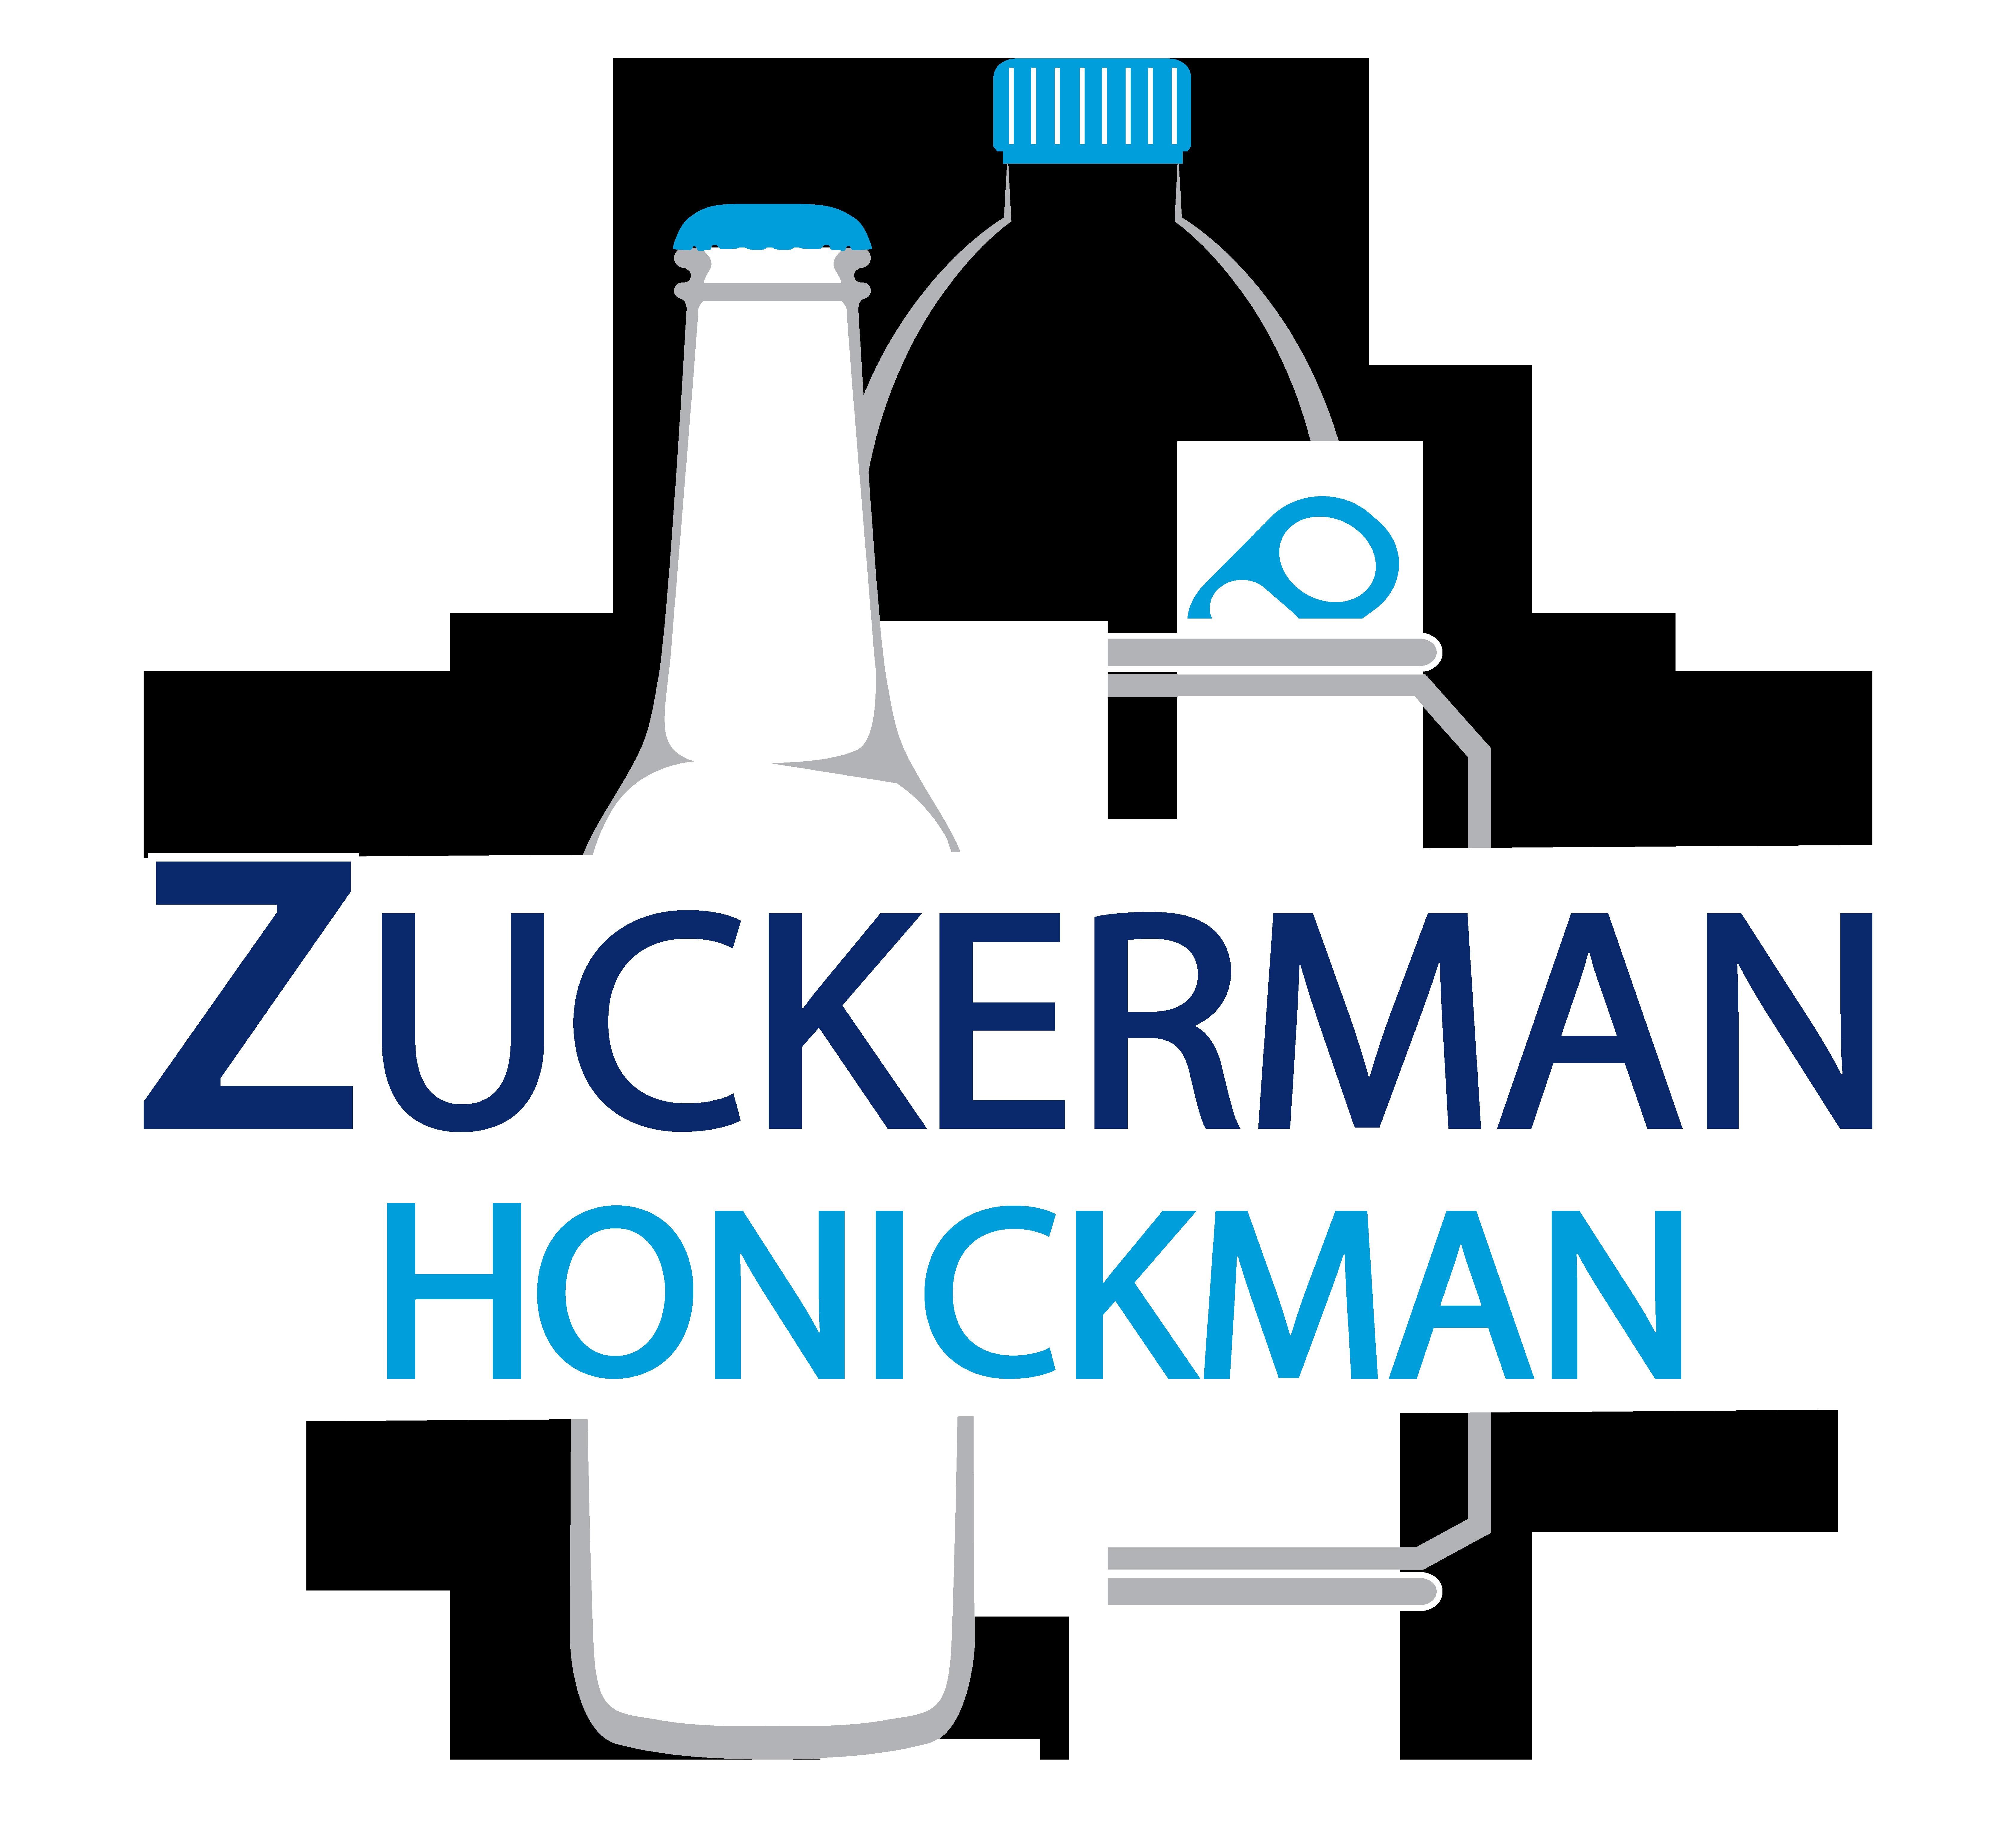 Zuckerman Honickman - sponsoring BevNET & NOSH Virtually Live Summer 2020